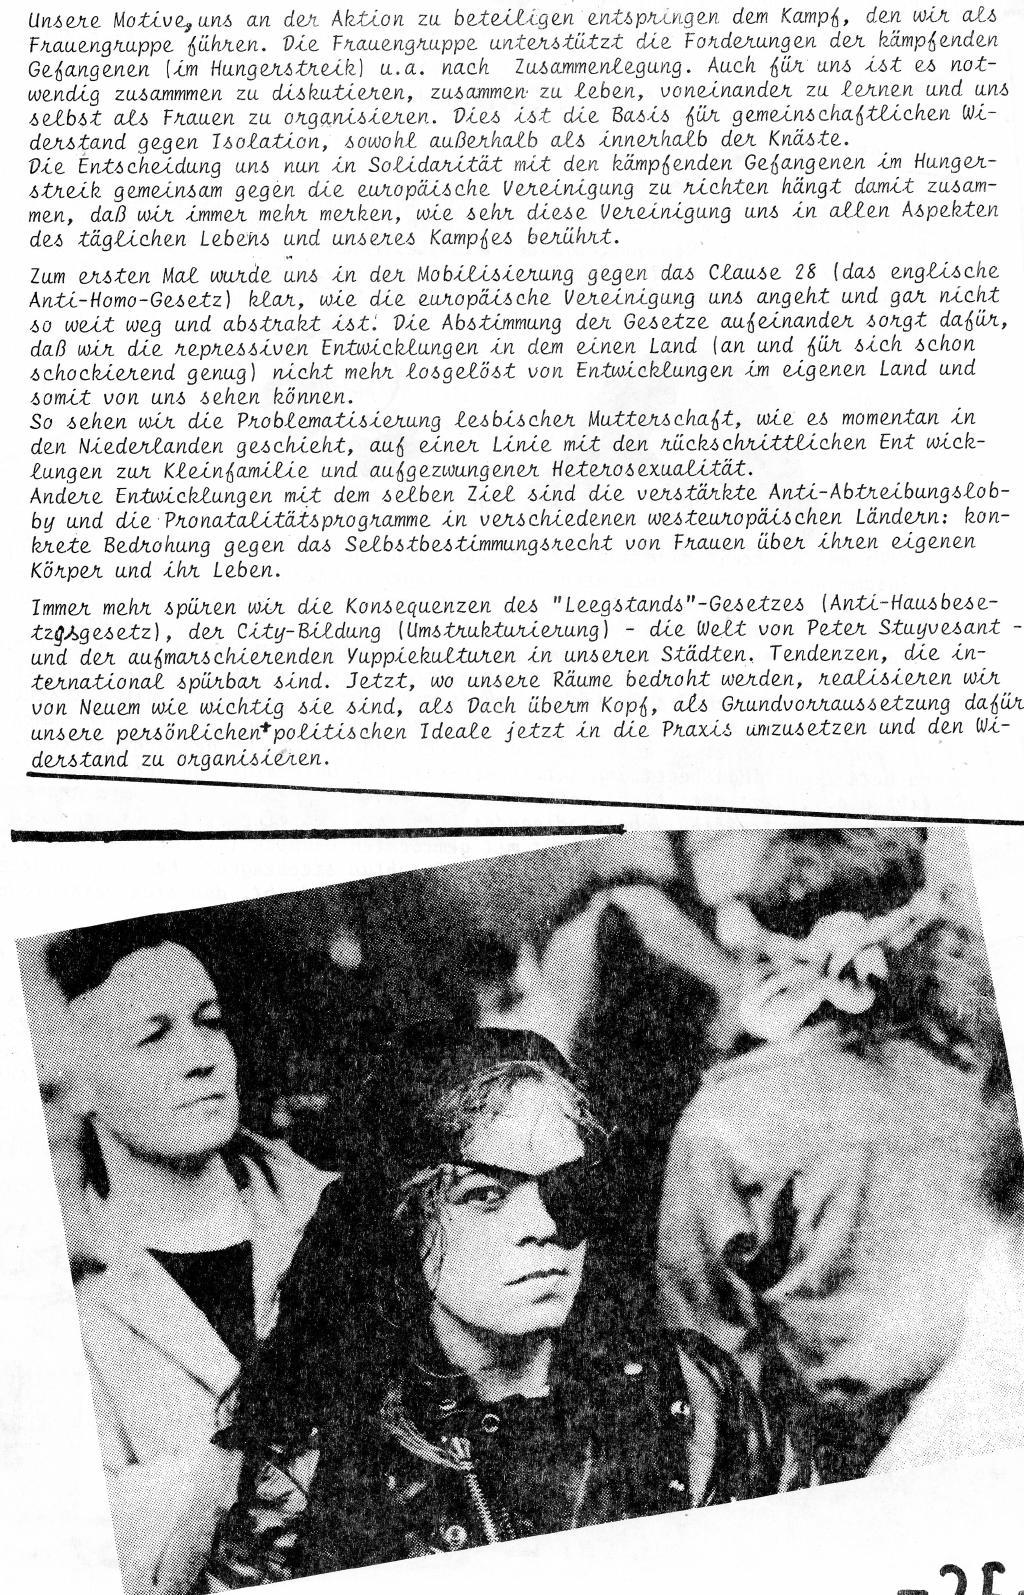 Belgien_Doku_Besetzung_EG_Kommission_1989_028